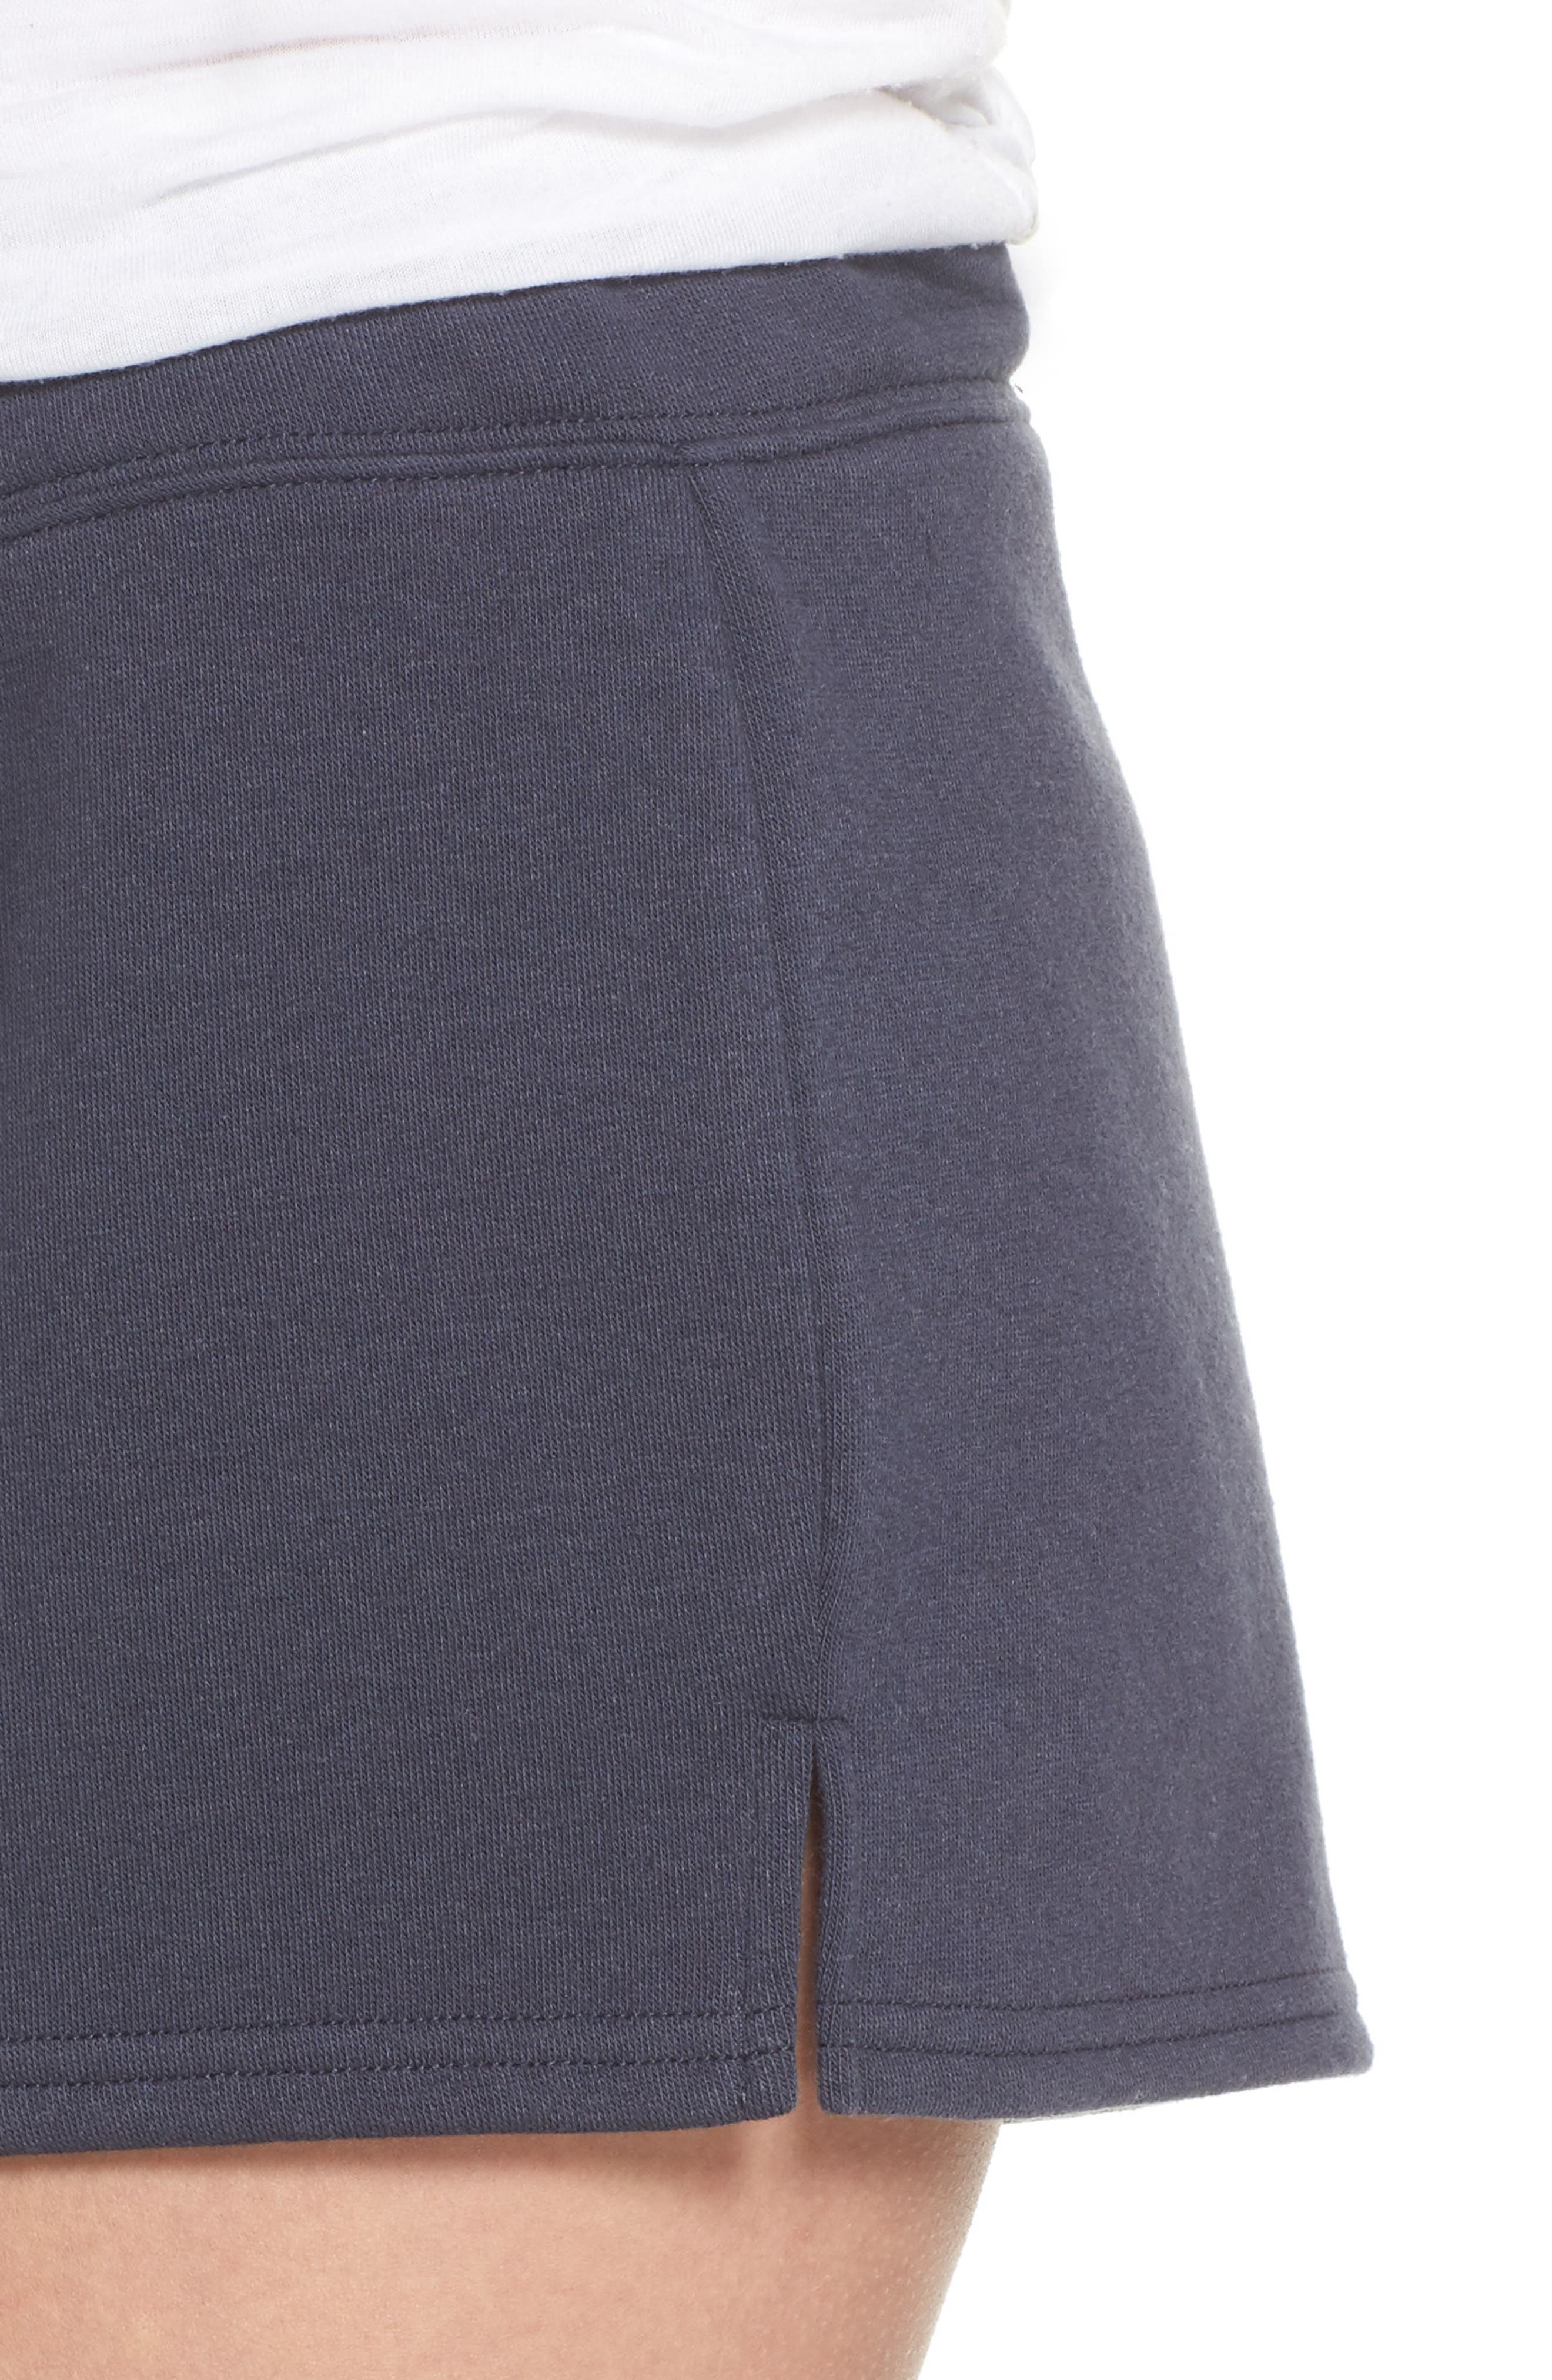 Take It Easy Lounge Shorts,                             Alternate thumbnail 6, color,                             Navy Blue